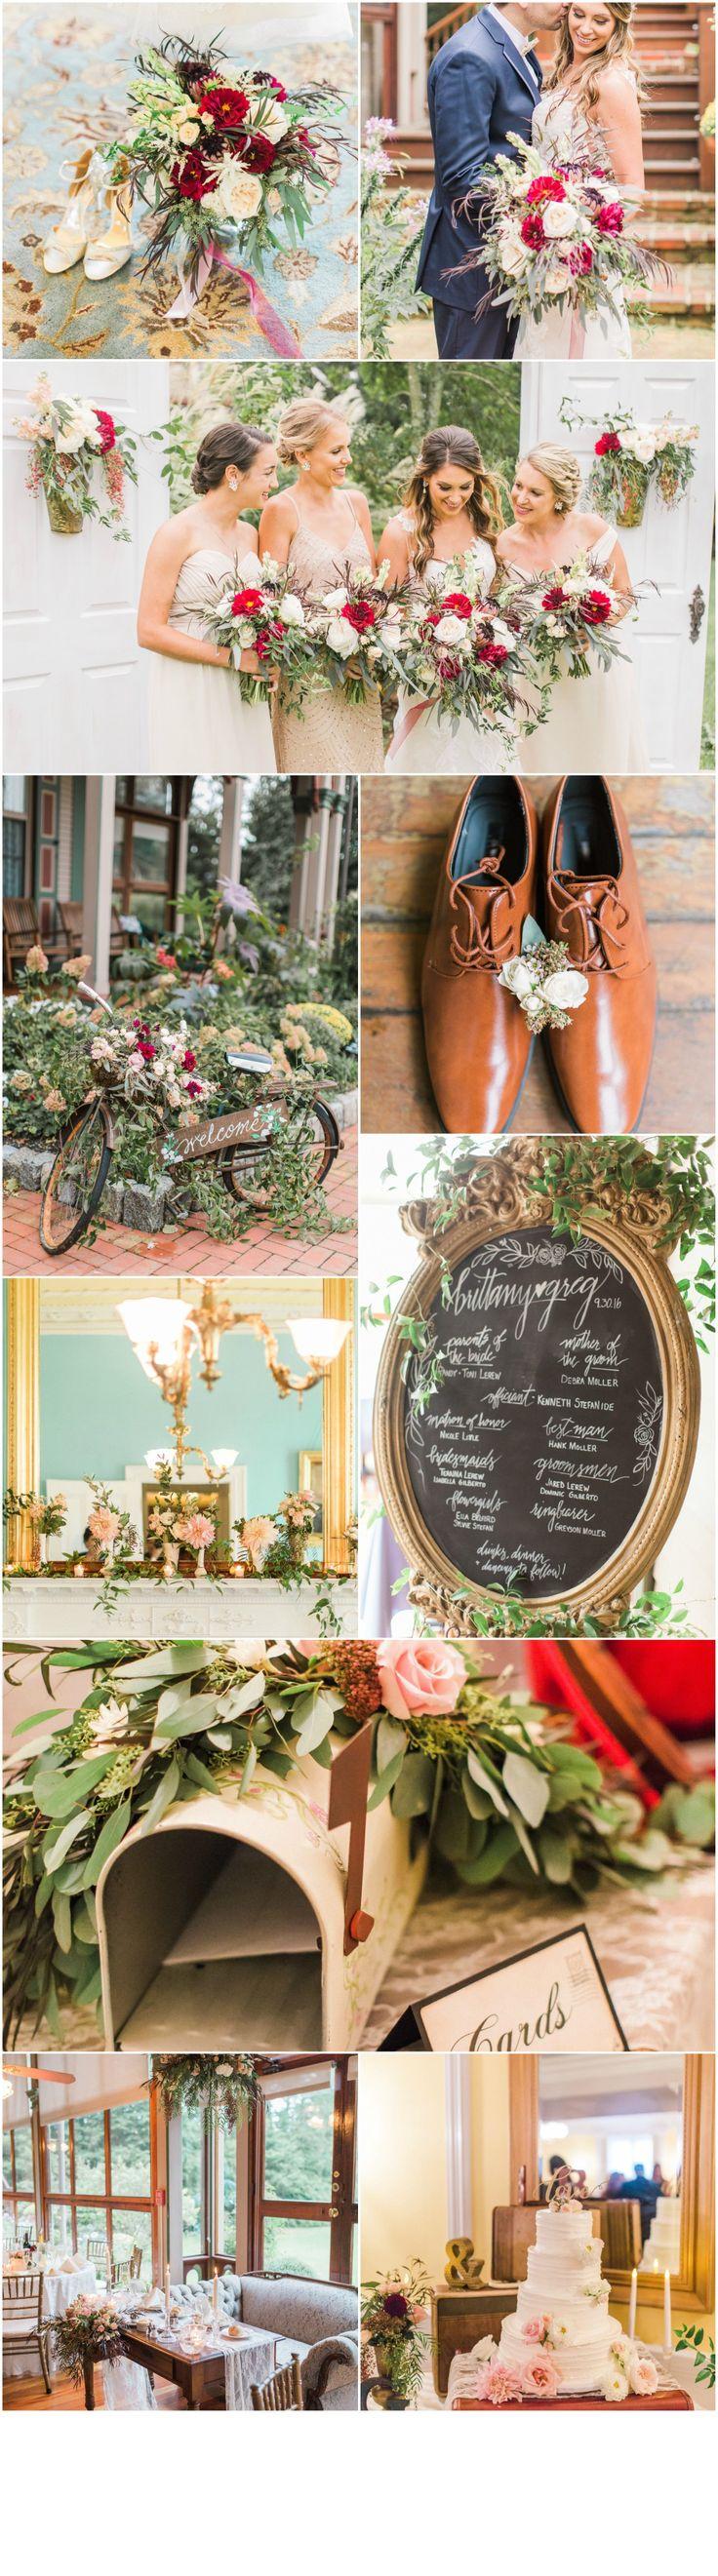 Cape May Wedding Florist - A Garden Party florist - Southern Mansion - Ashley Errington Photography - red wedding flowers - fall wedding - chalk art - vintage wedding